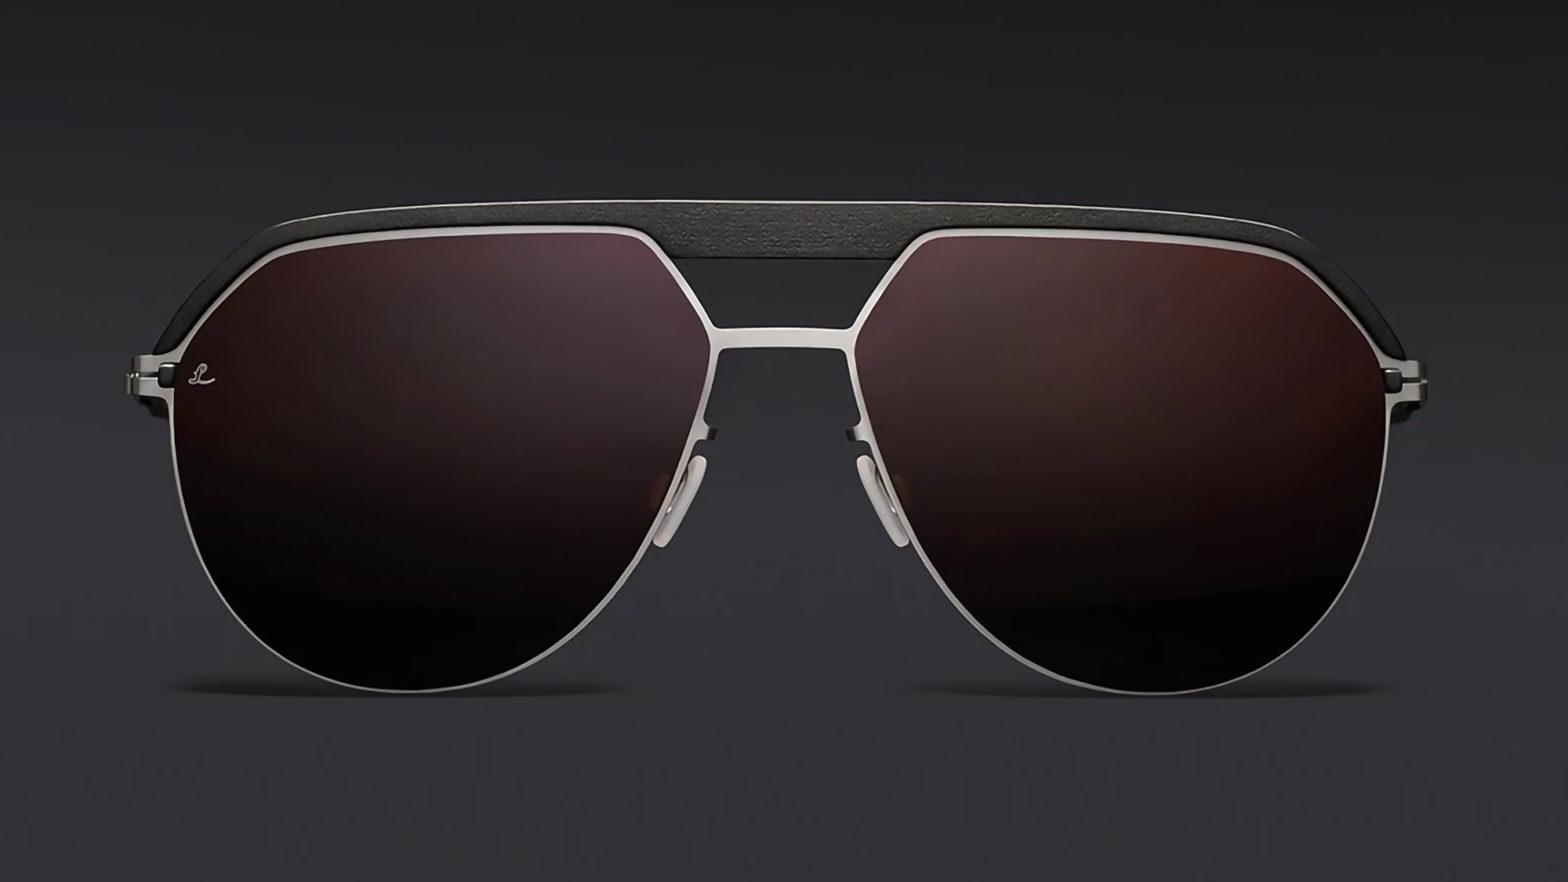 MYKITA x Leica Sunglasses